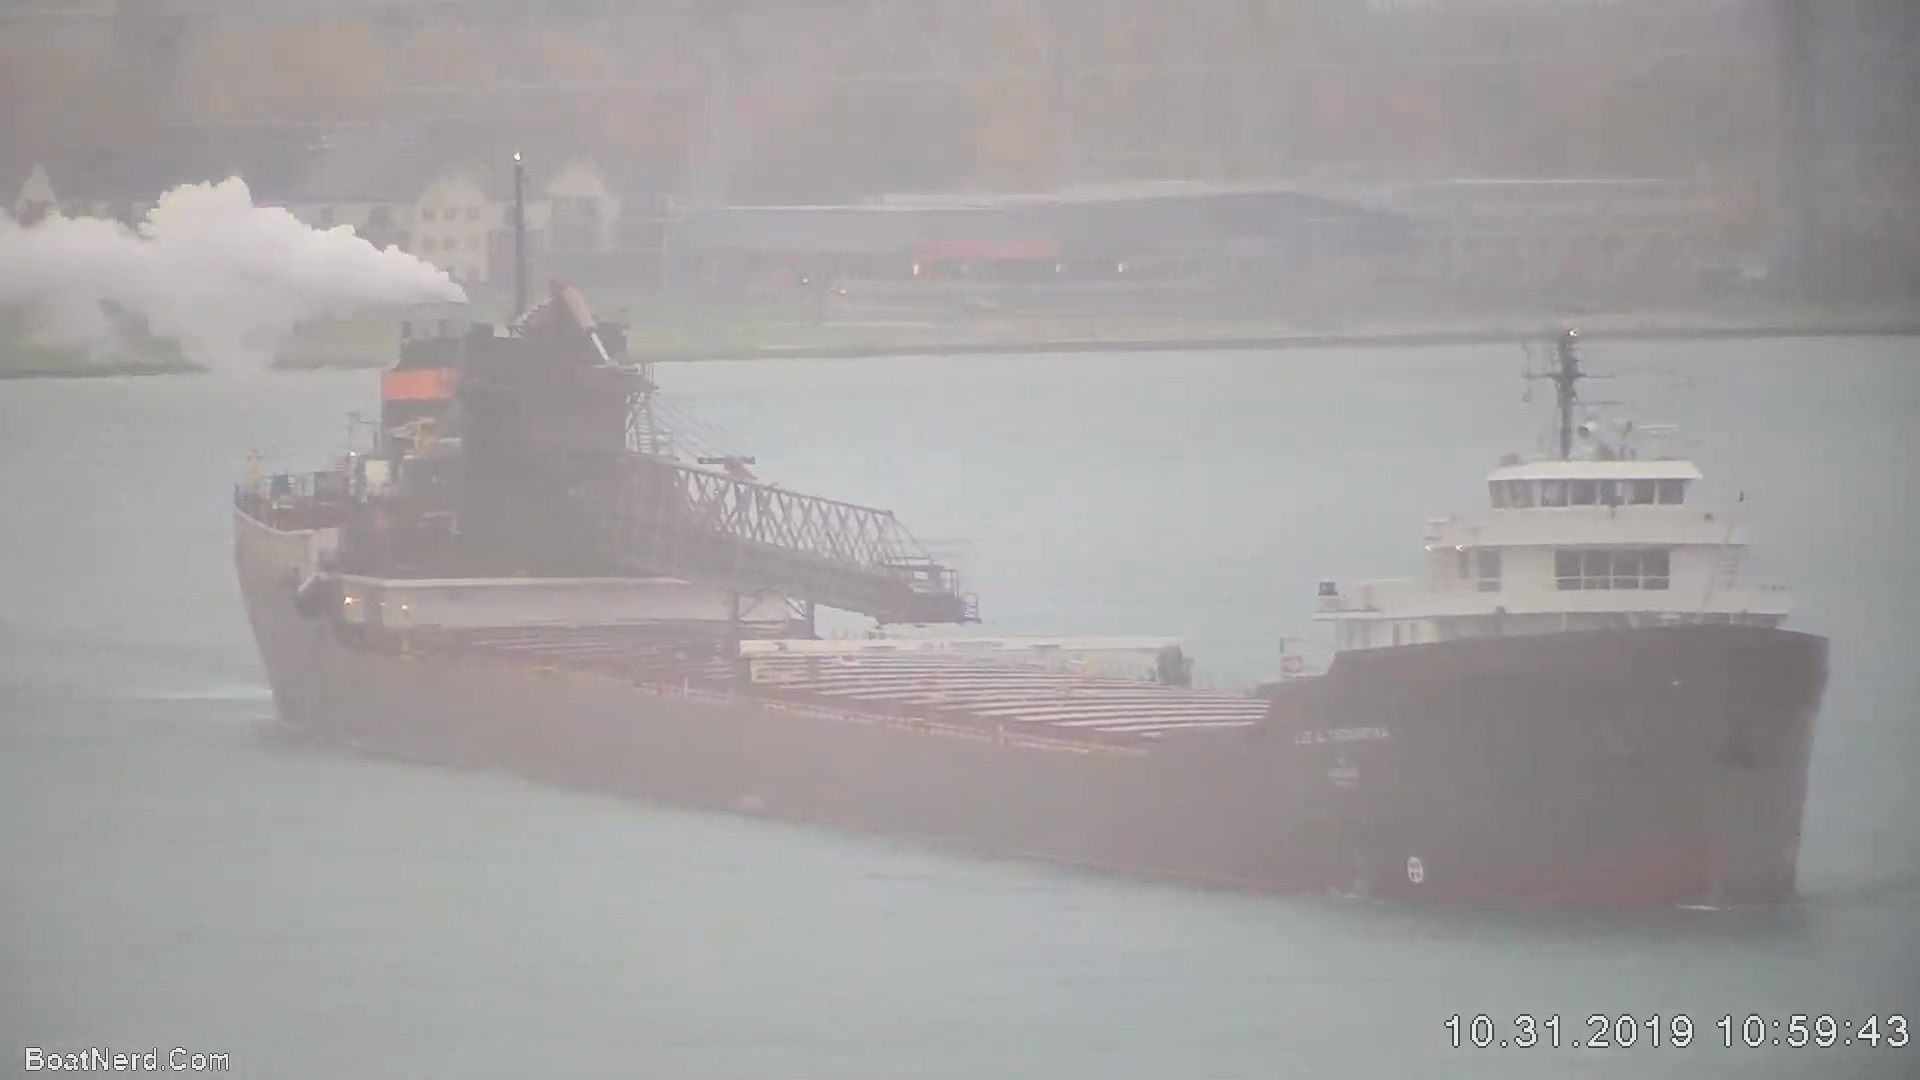 Merchant Ship - Lee A. Tregurtha - Self-Unloader